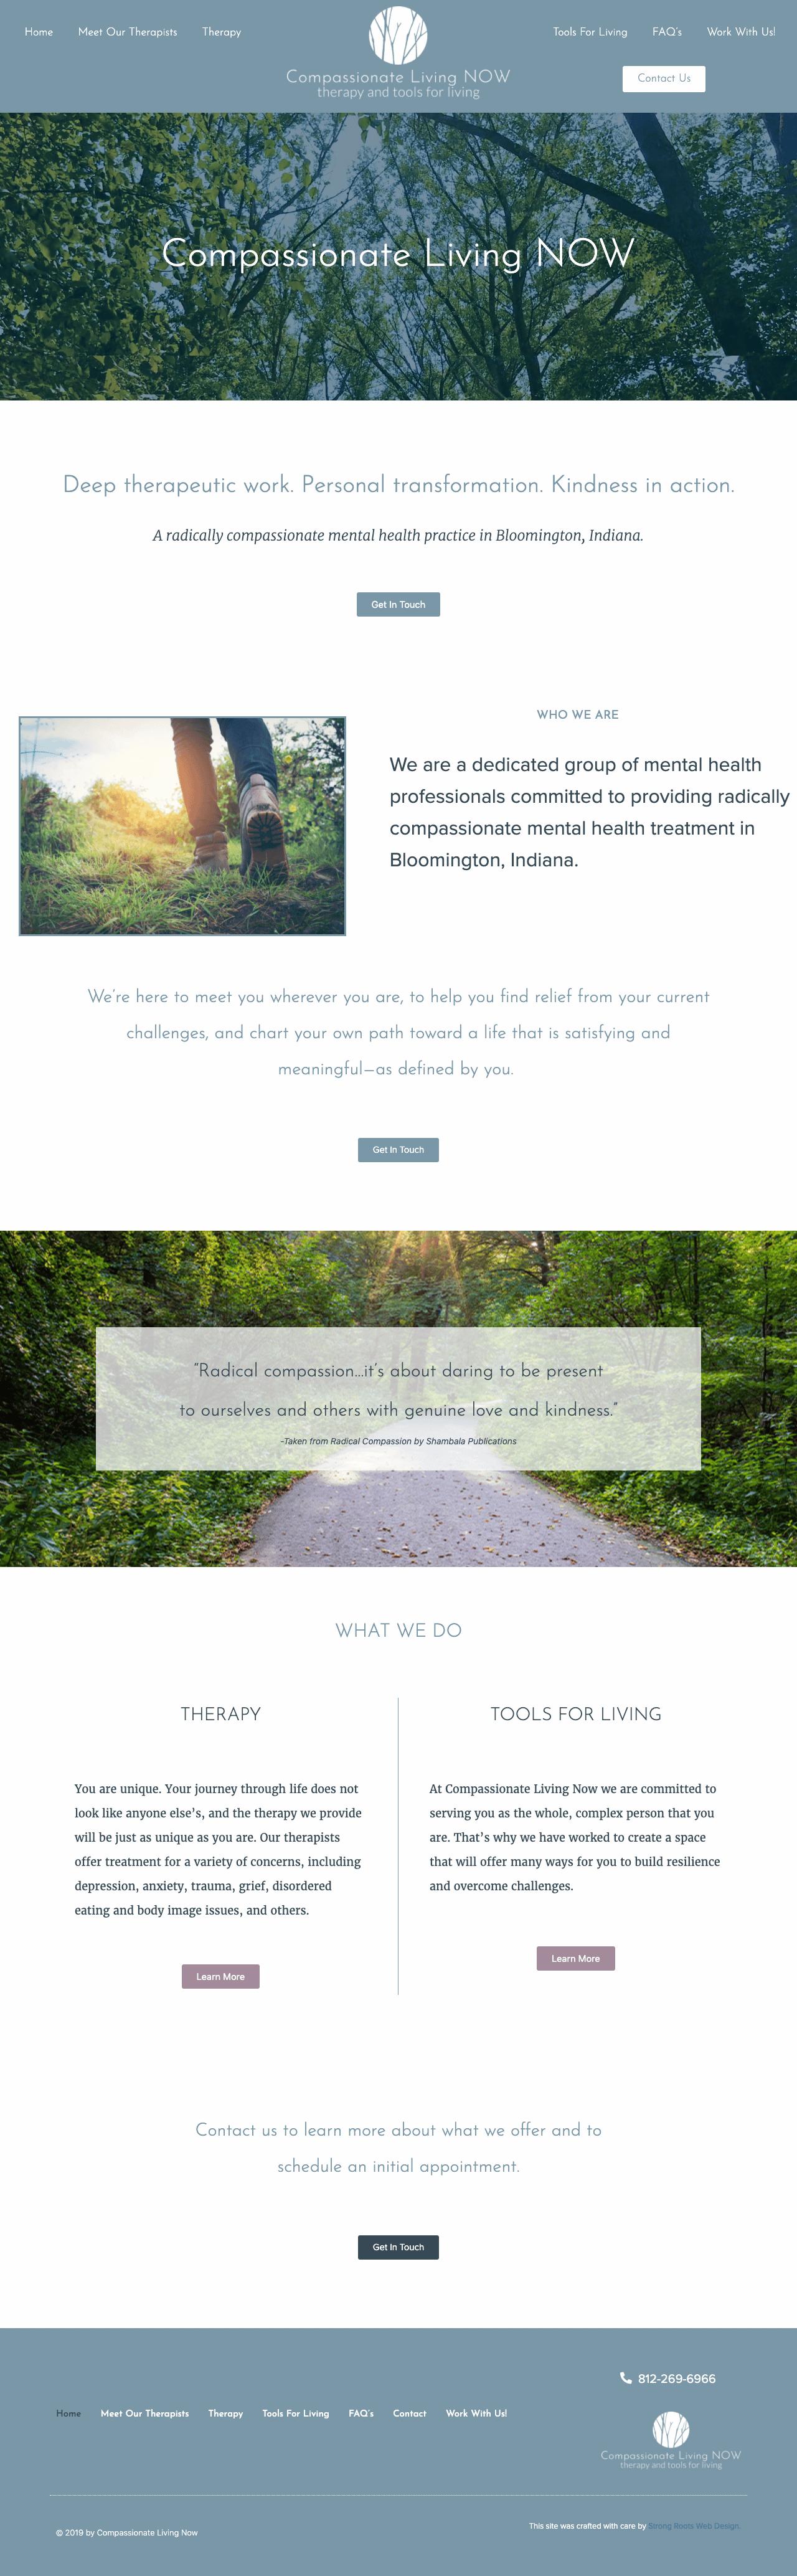 CLN_homepage